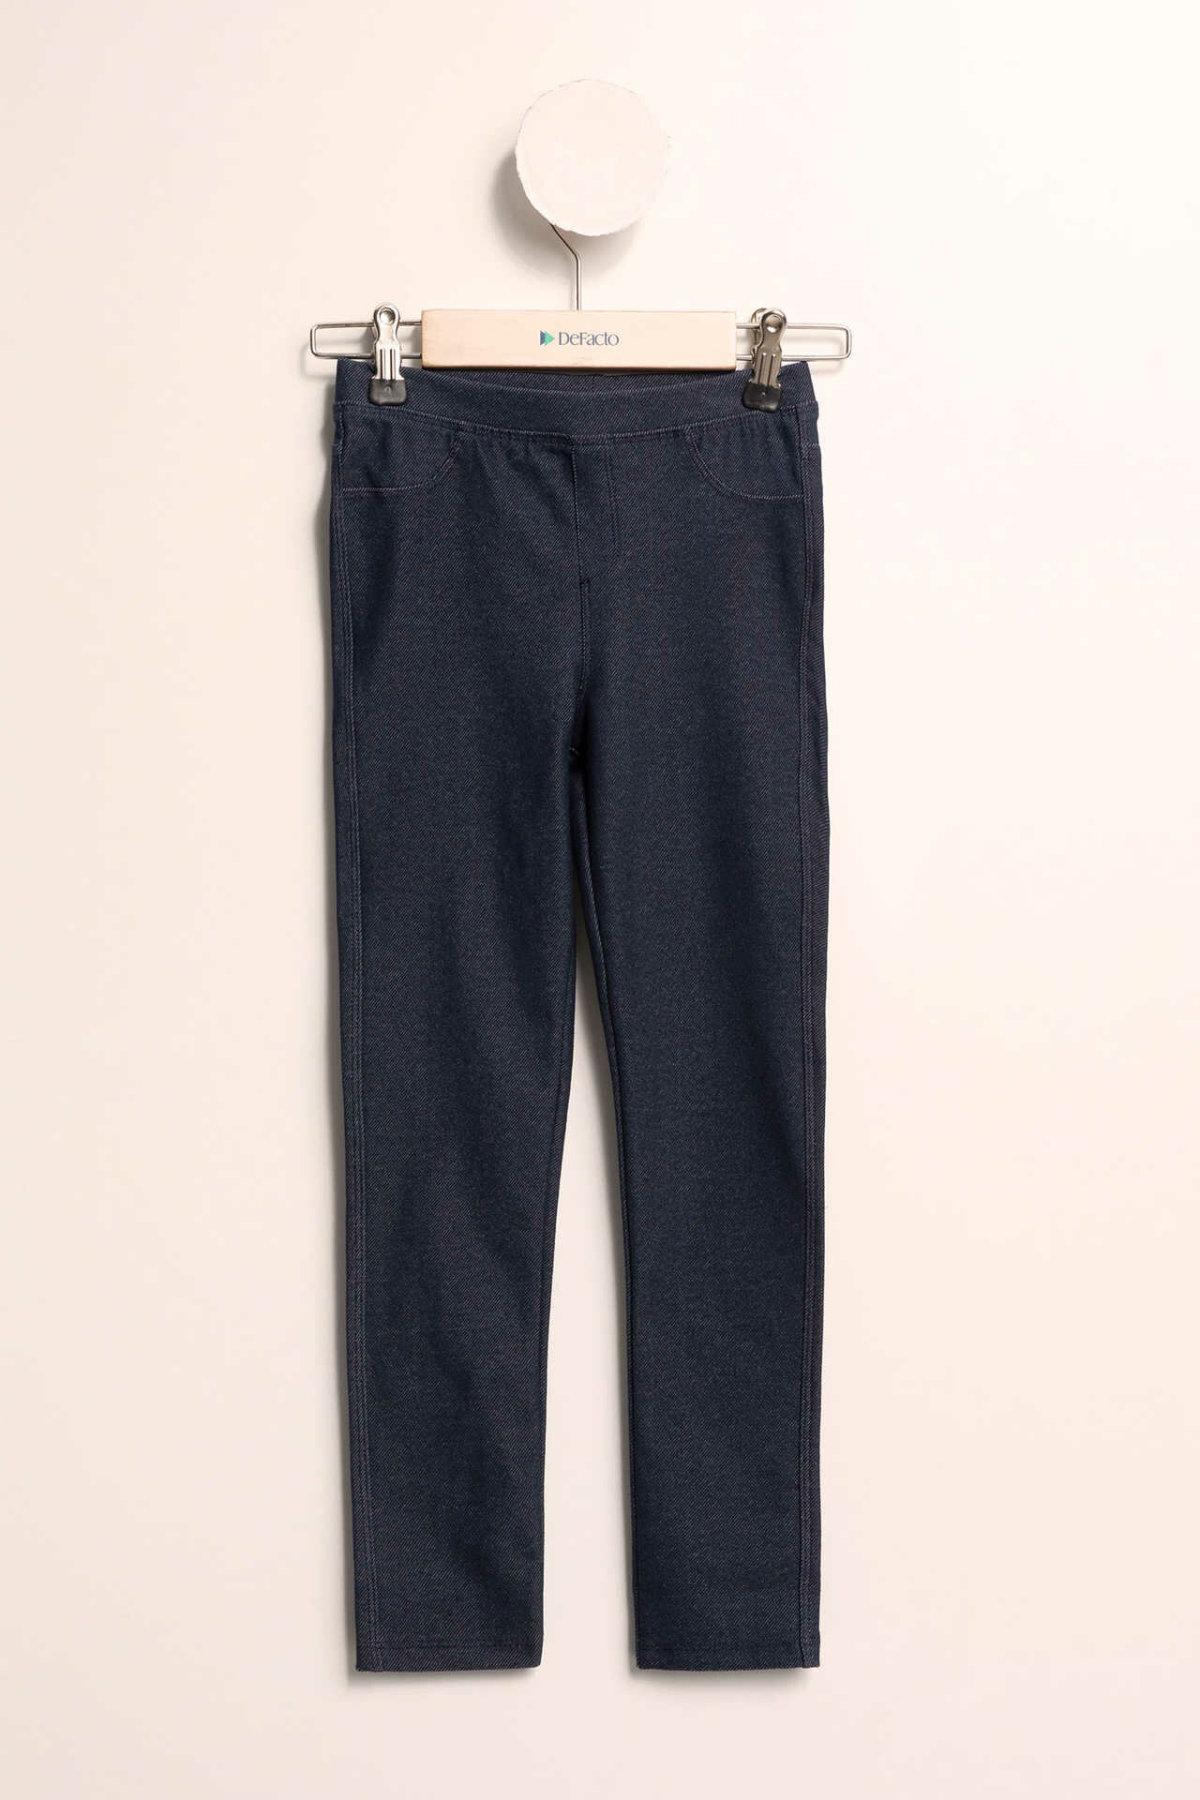 DeFacto Fashion Girl Sport Leggings Solid Comfort Jogging Pants Kids Casual Elastic Skinny Long Sportpants Girls - H9615A619SP